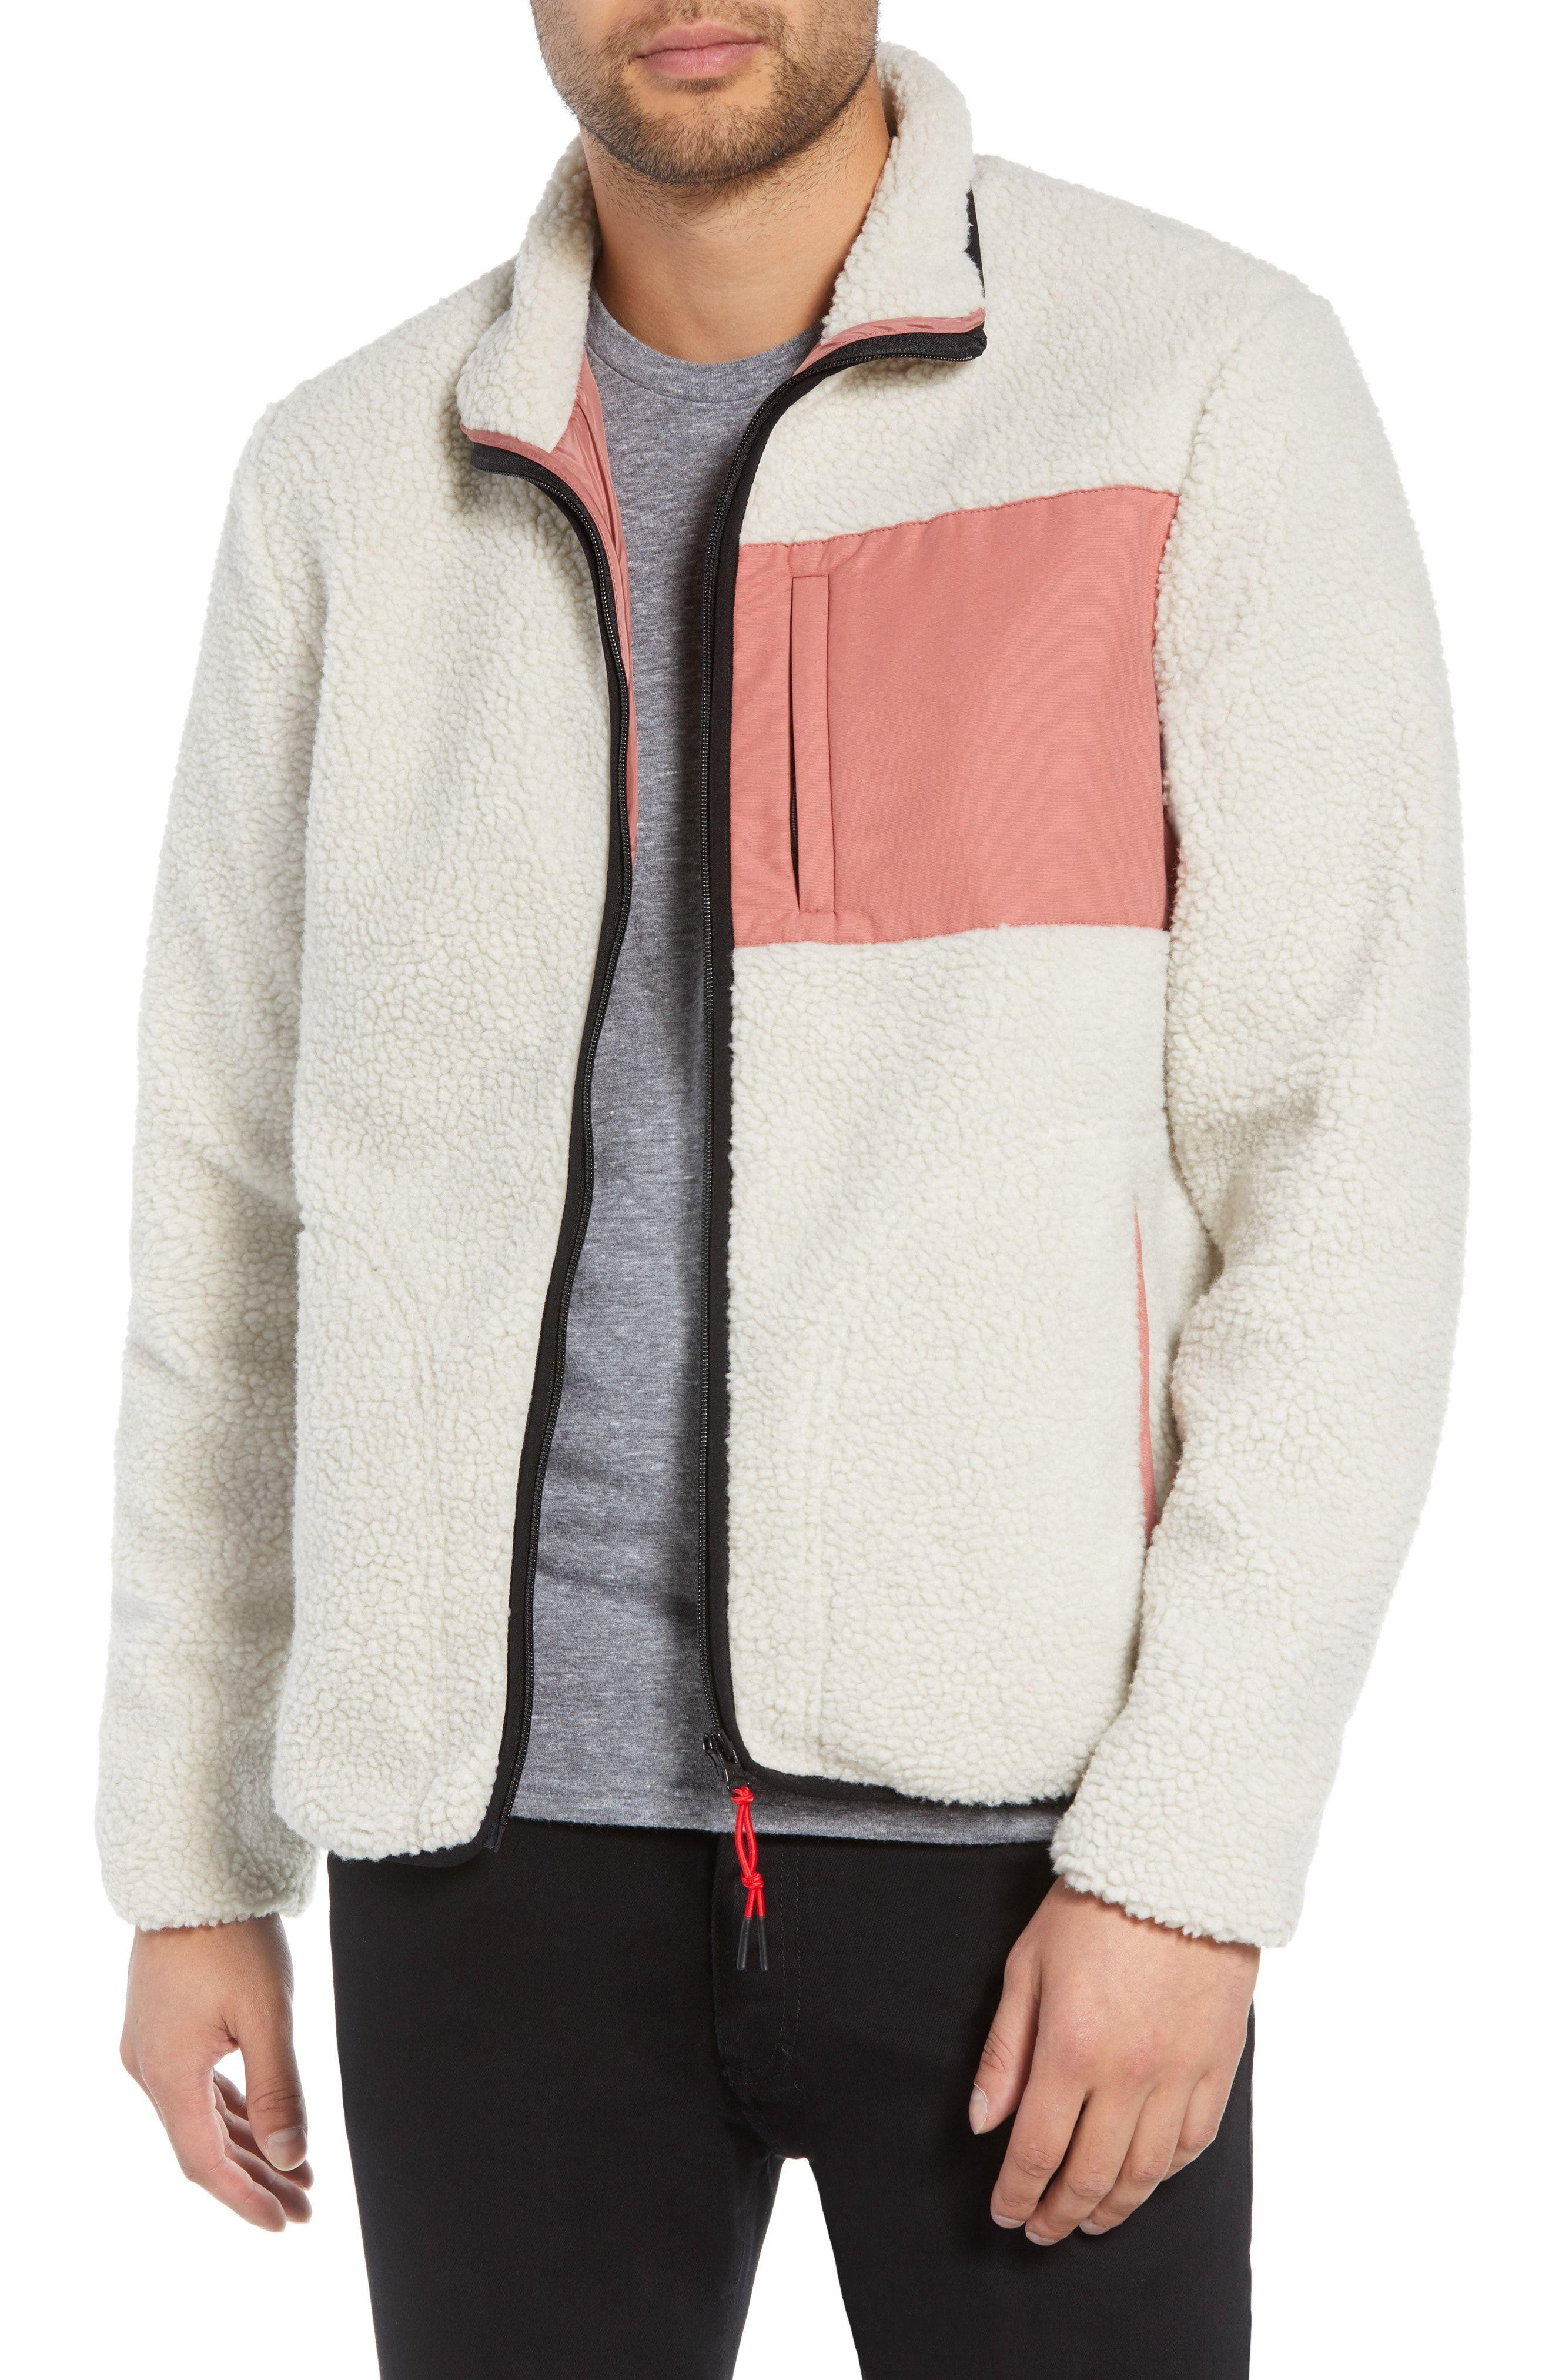 da32eac7e1 Chic WeSC Moritz Fleece Jacket online. [$158] topselectshops from top store